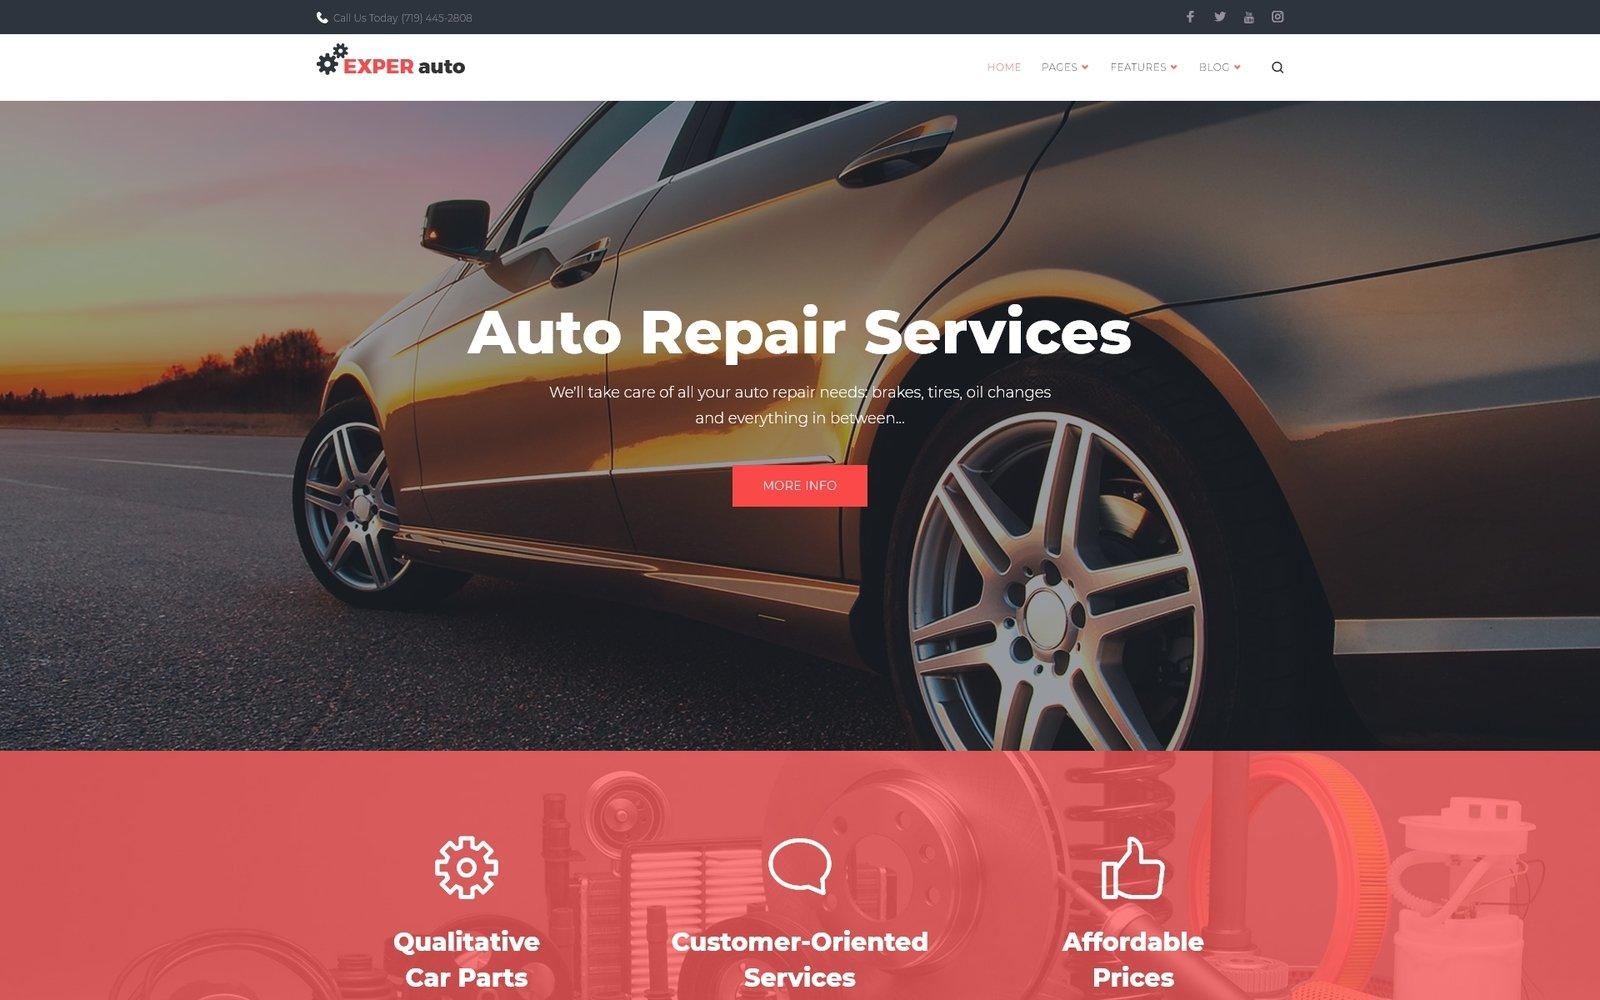 EXPER Auto - Auto Repair Services Fully Responsive WordPress Theme №65608 - скриншот